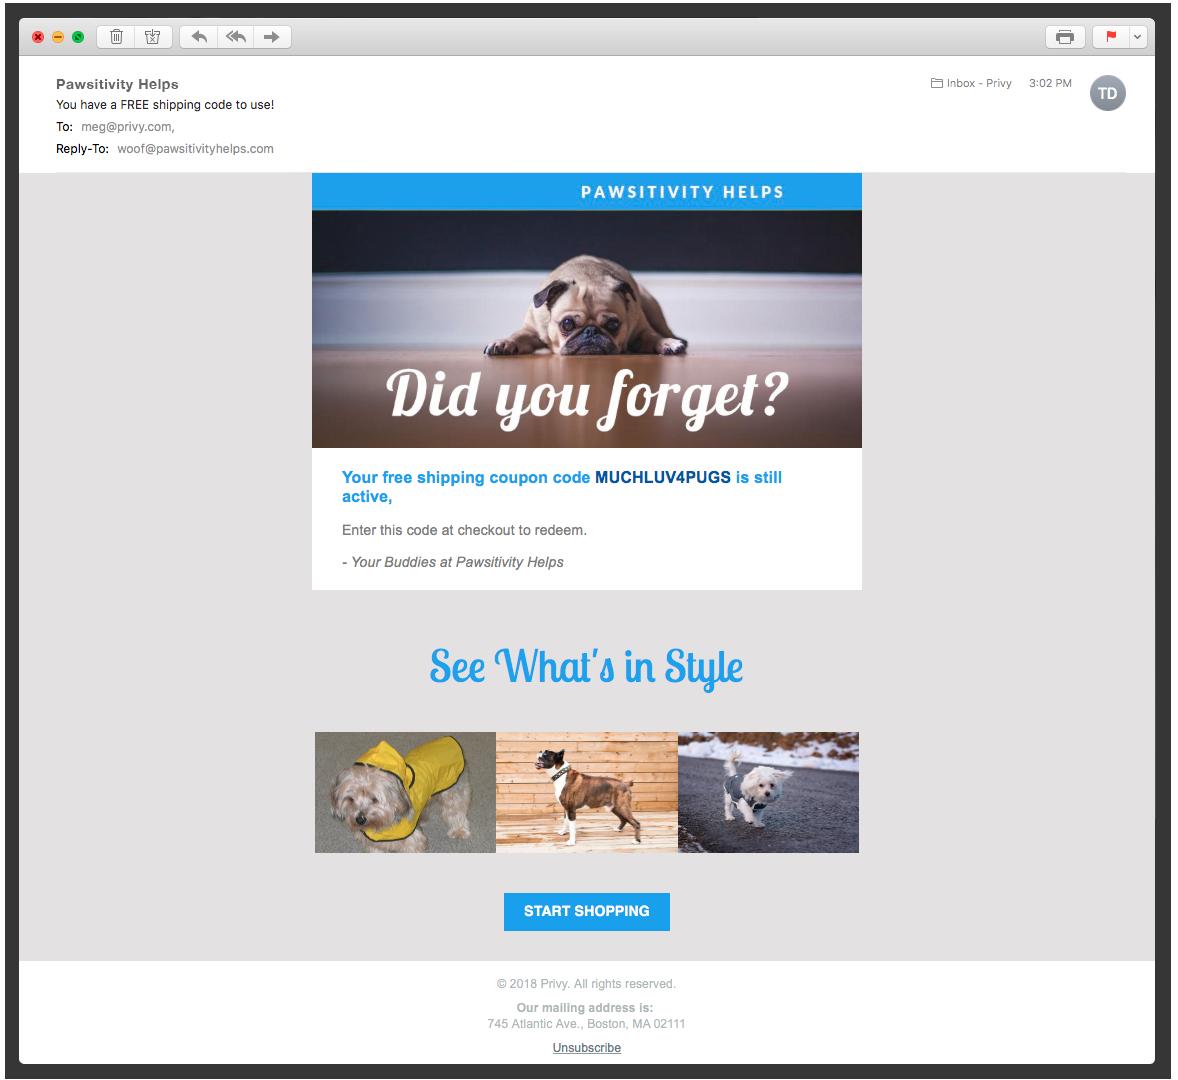 Email_Coupon+Reminder